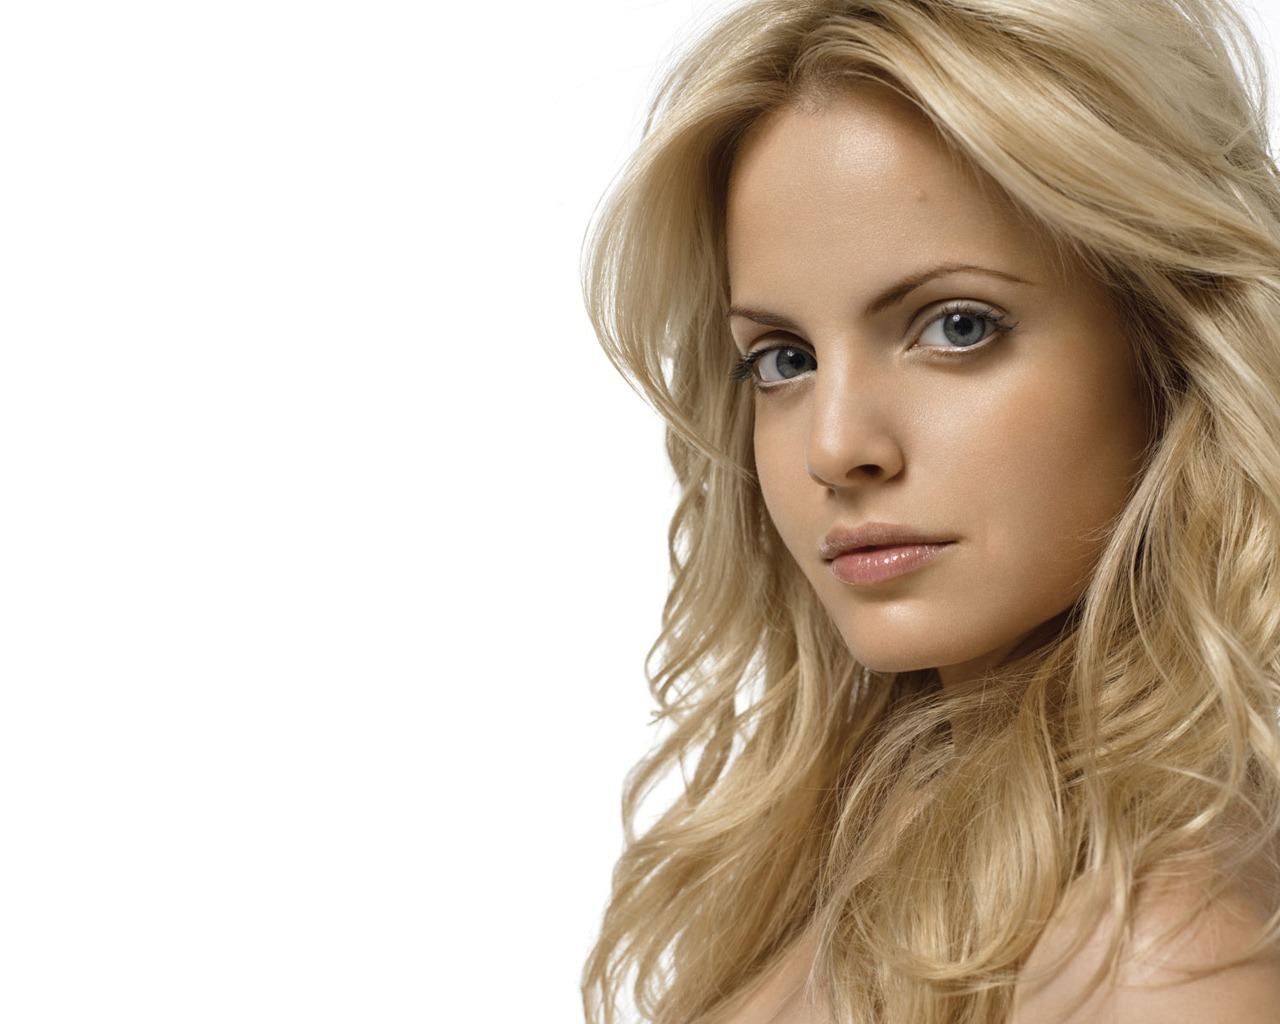 http://3.bp.blogspot.com/-NWeXGyRrr70/TpvPKOf01jI/AAAAAAAAAig/TYe-NgDdspQ/s1600/mena-suvari-blond-1280-1024-4411.jpg